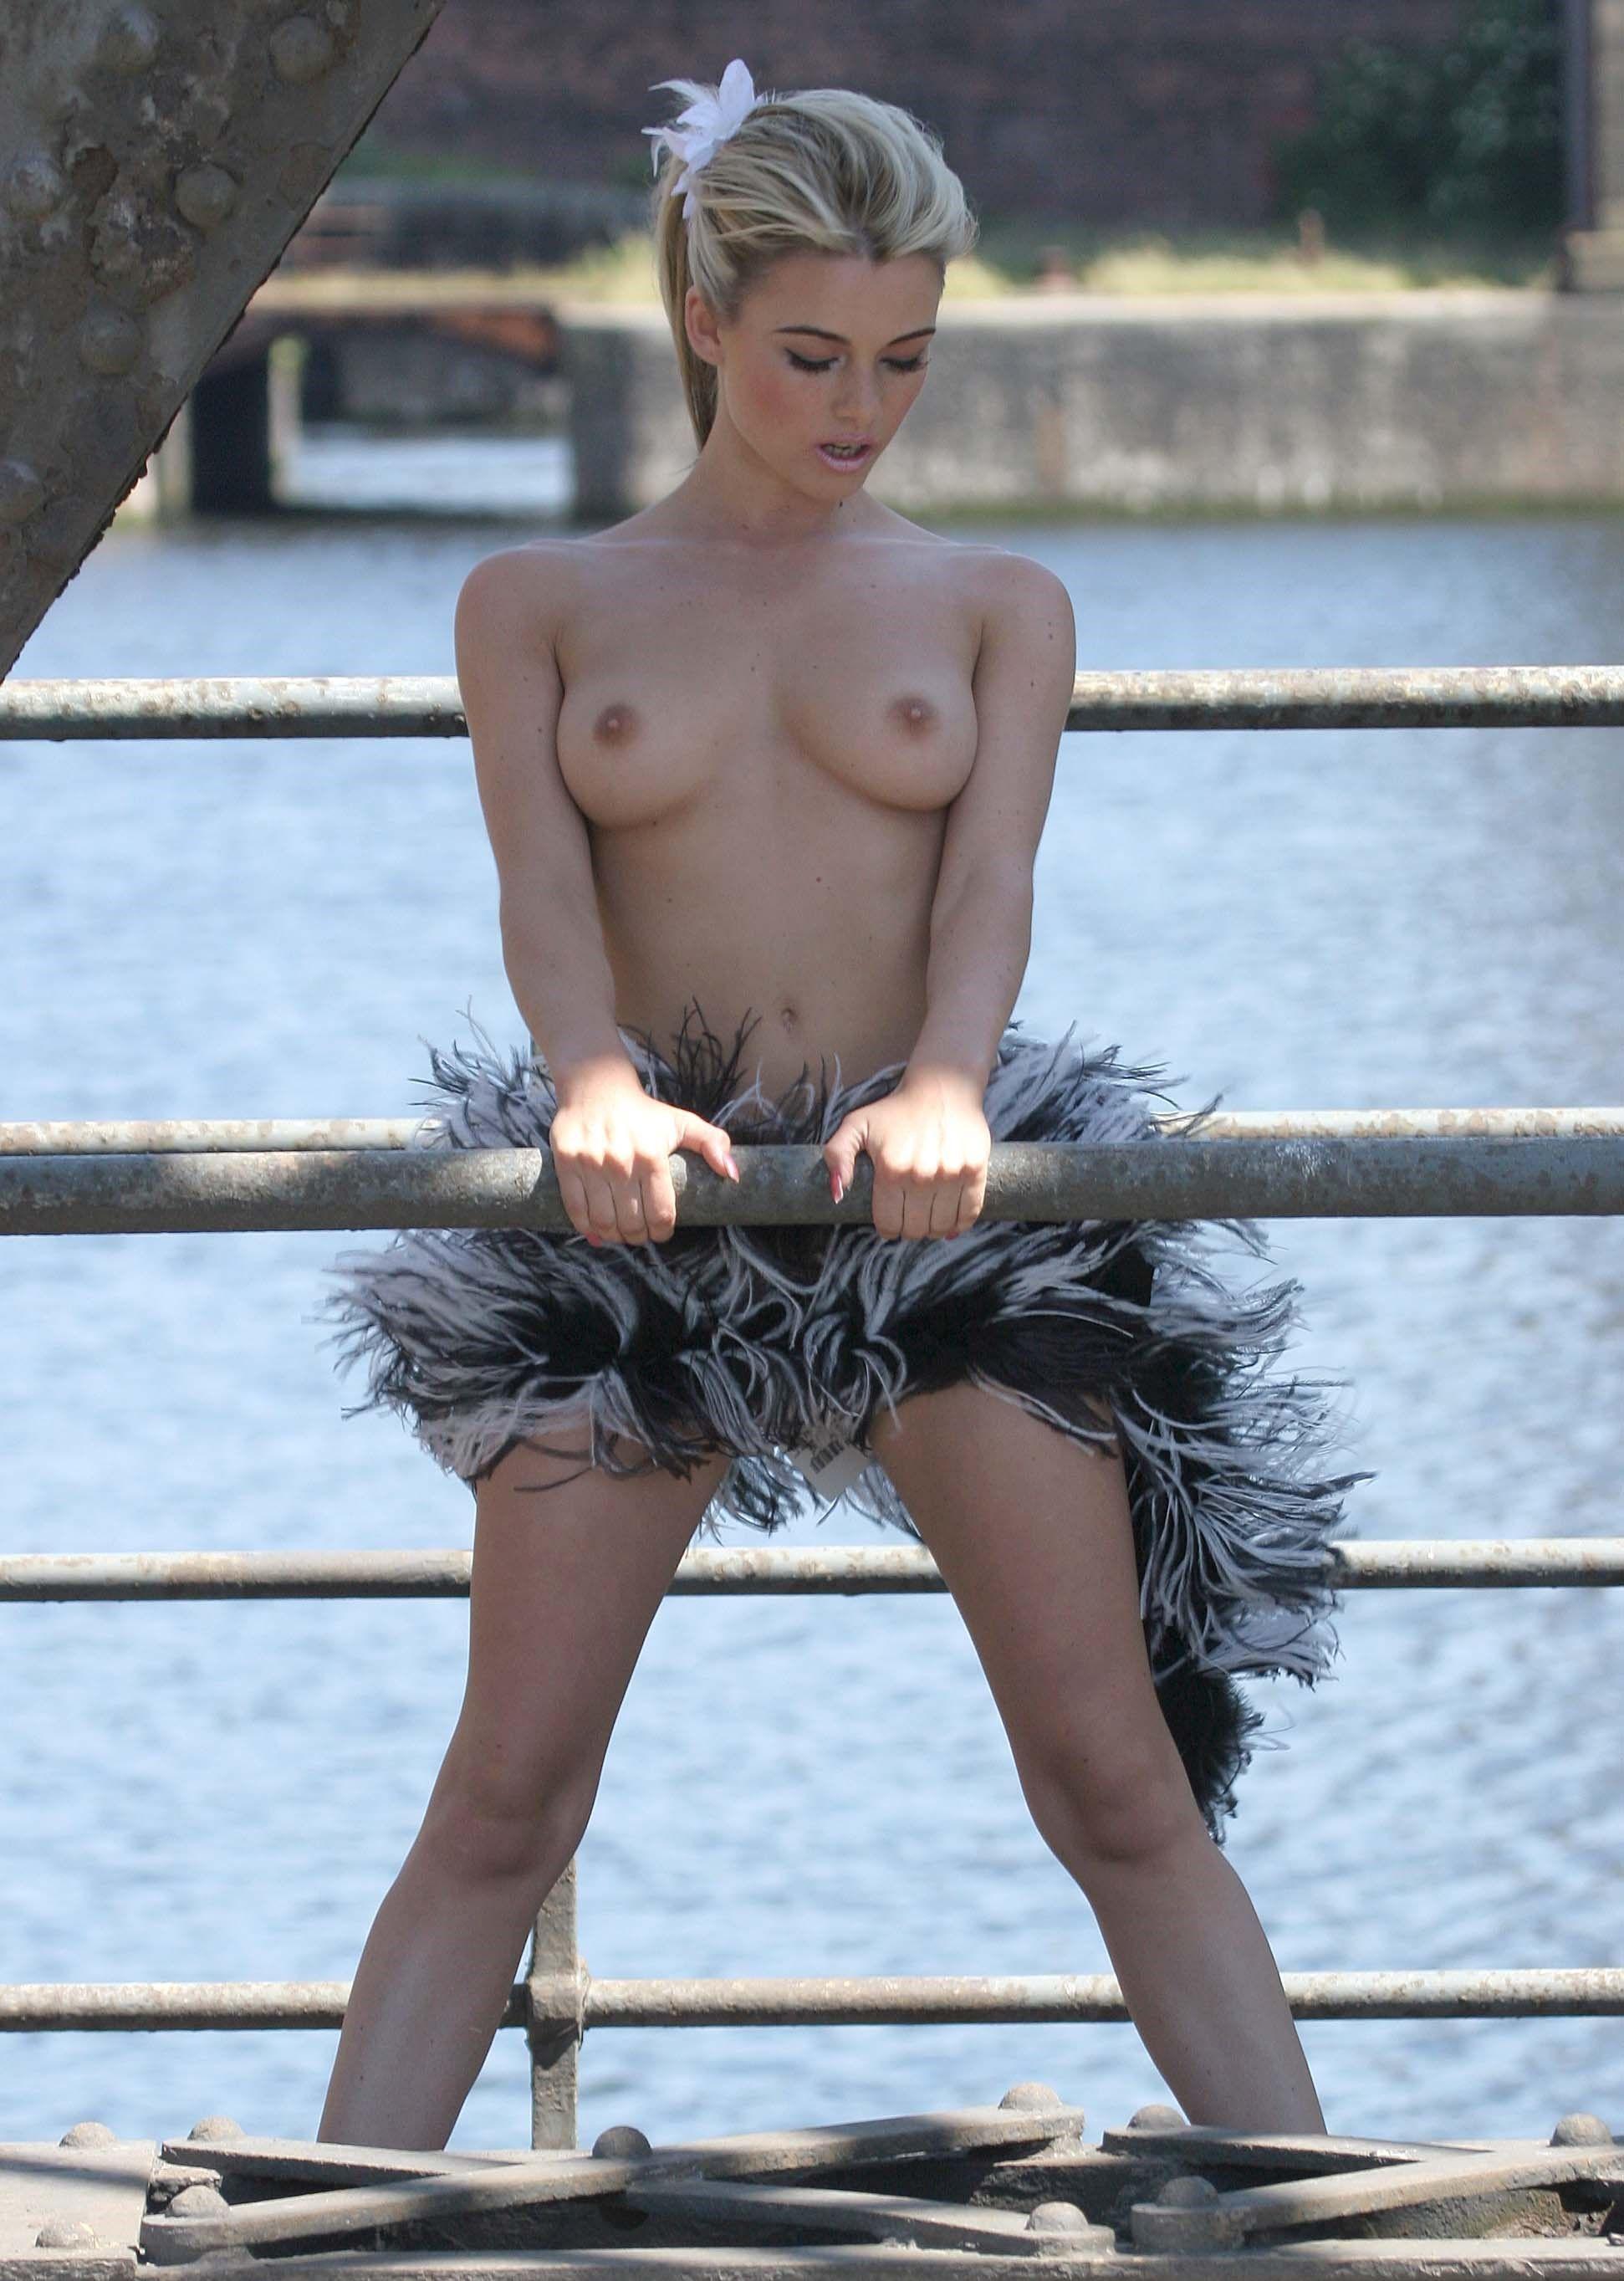 Katie downes topless 7 photos